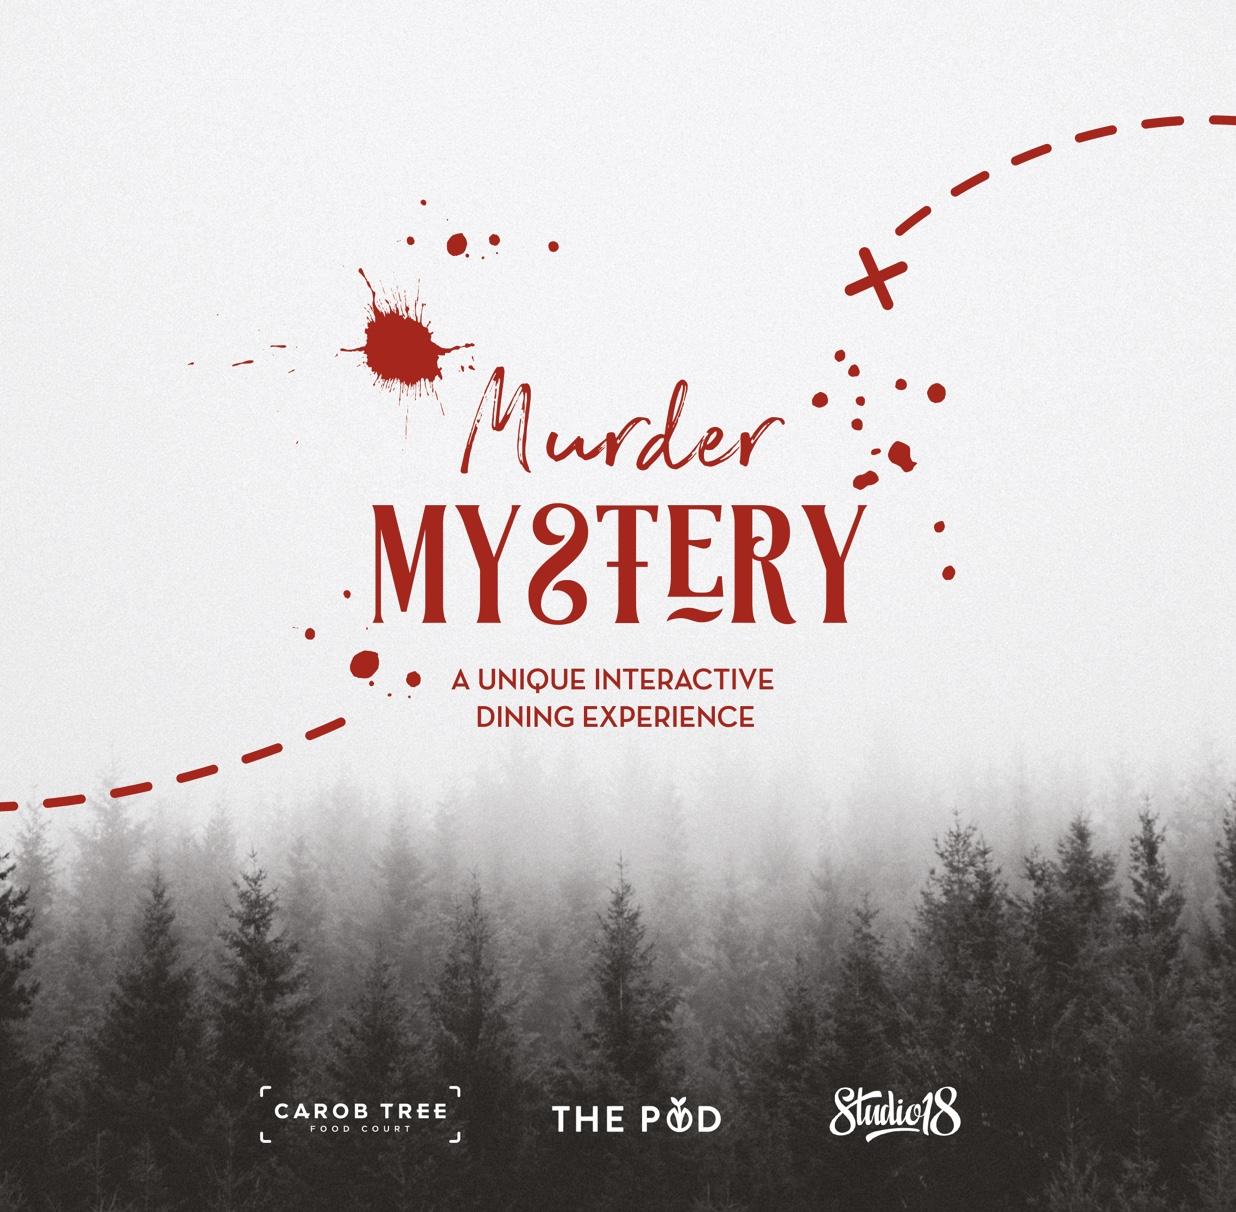 Carob Tree's Murder Mystery flyer